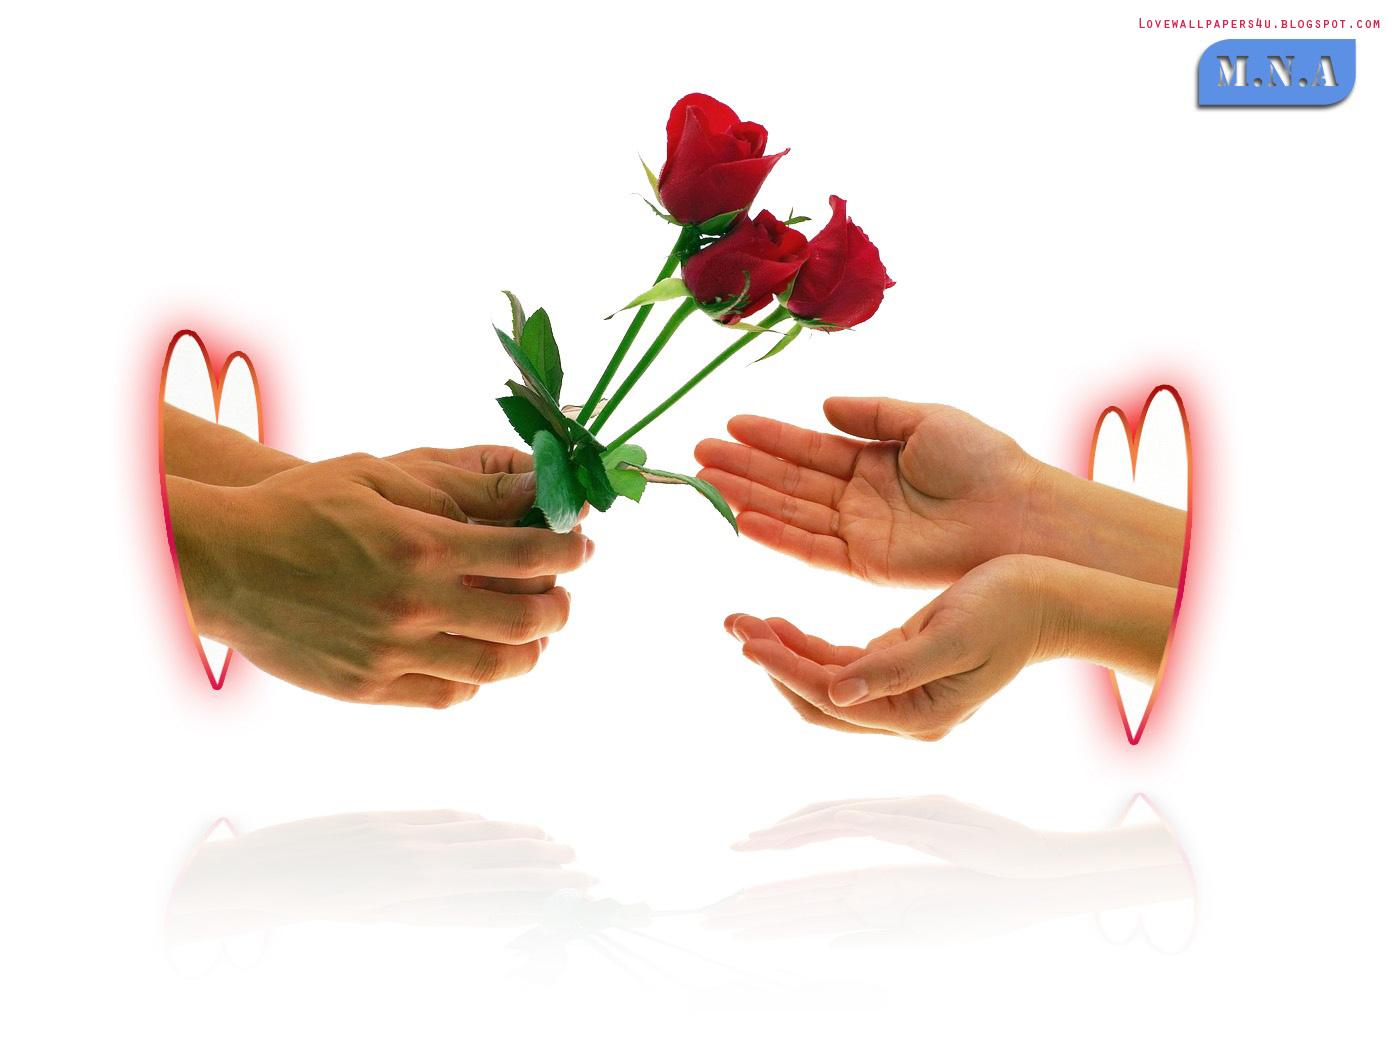 https://2.bp.blogspot.com/-NSVxuosaEJM/T7295itBvII/AAAAAAAAAfM/q9yRPUHWXD4/s1600/Free_love-wallpapers..jpg